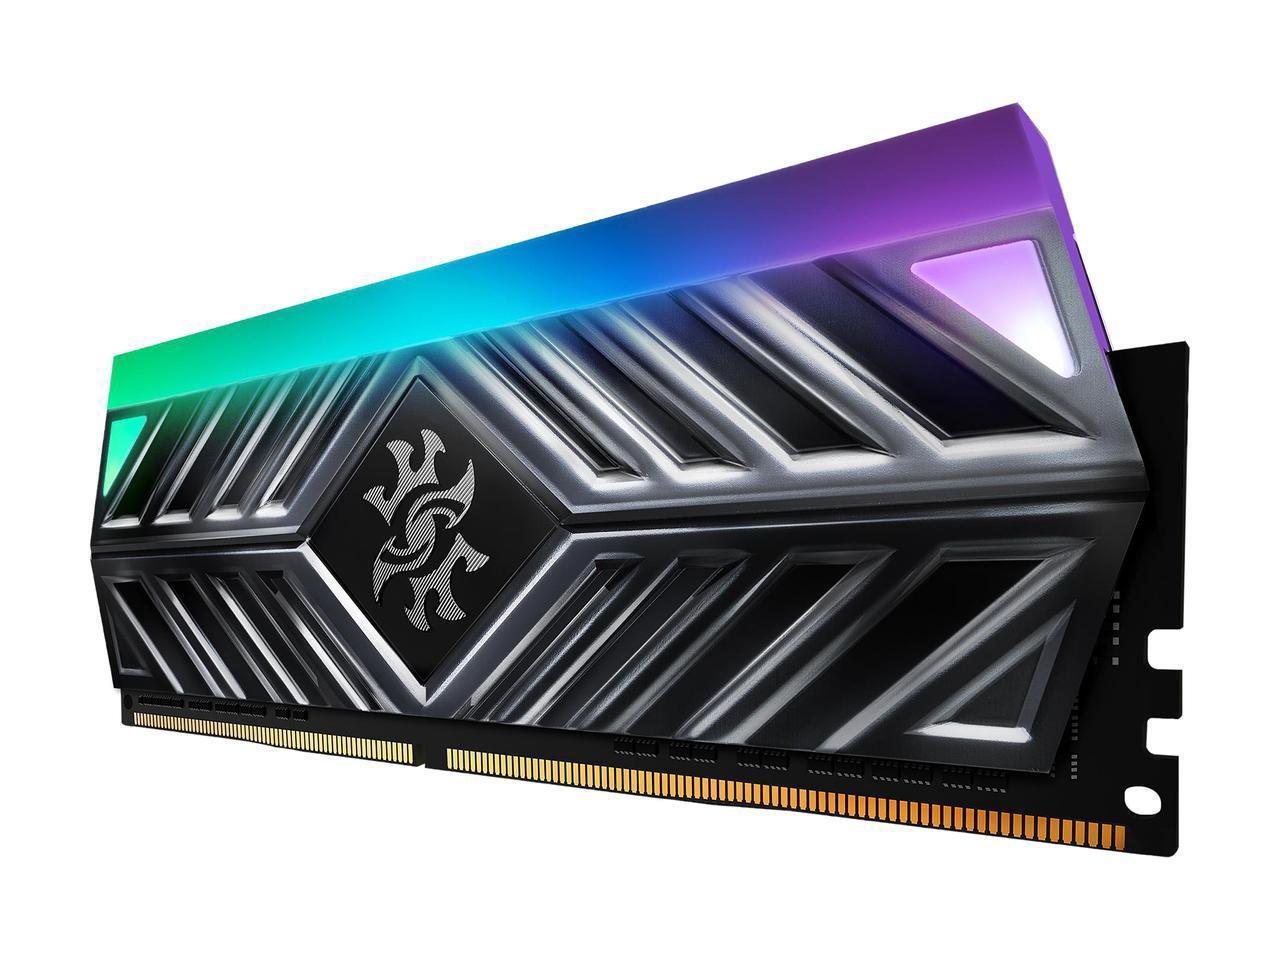 MODULO 8GB (3600 MHZ) SPECTRIX D41 RGB - XPG